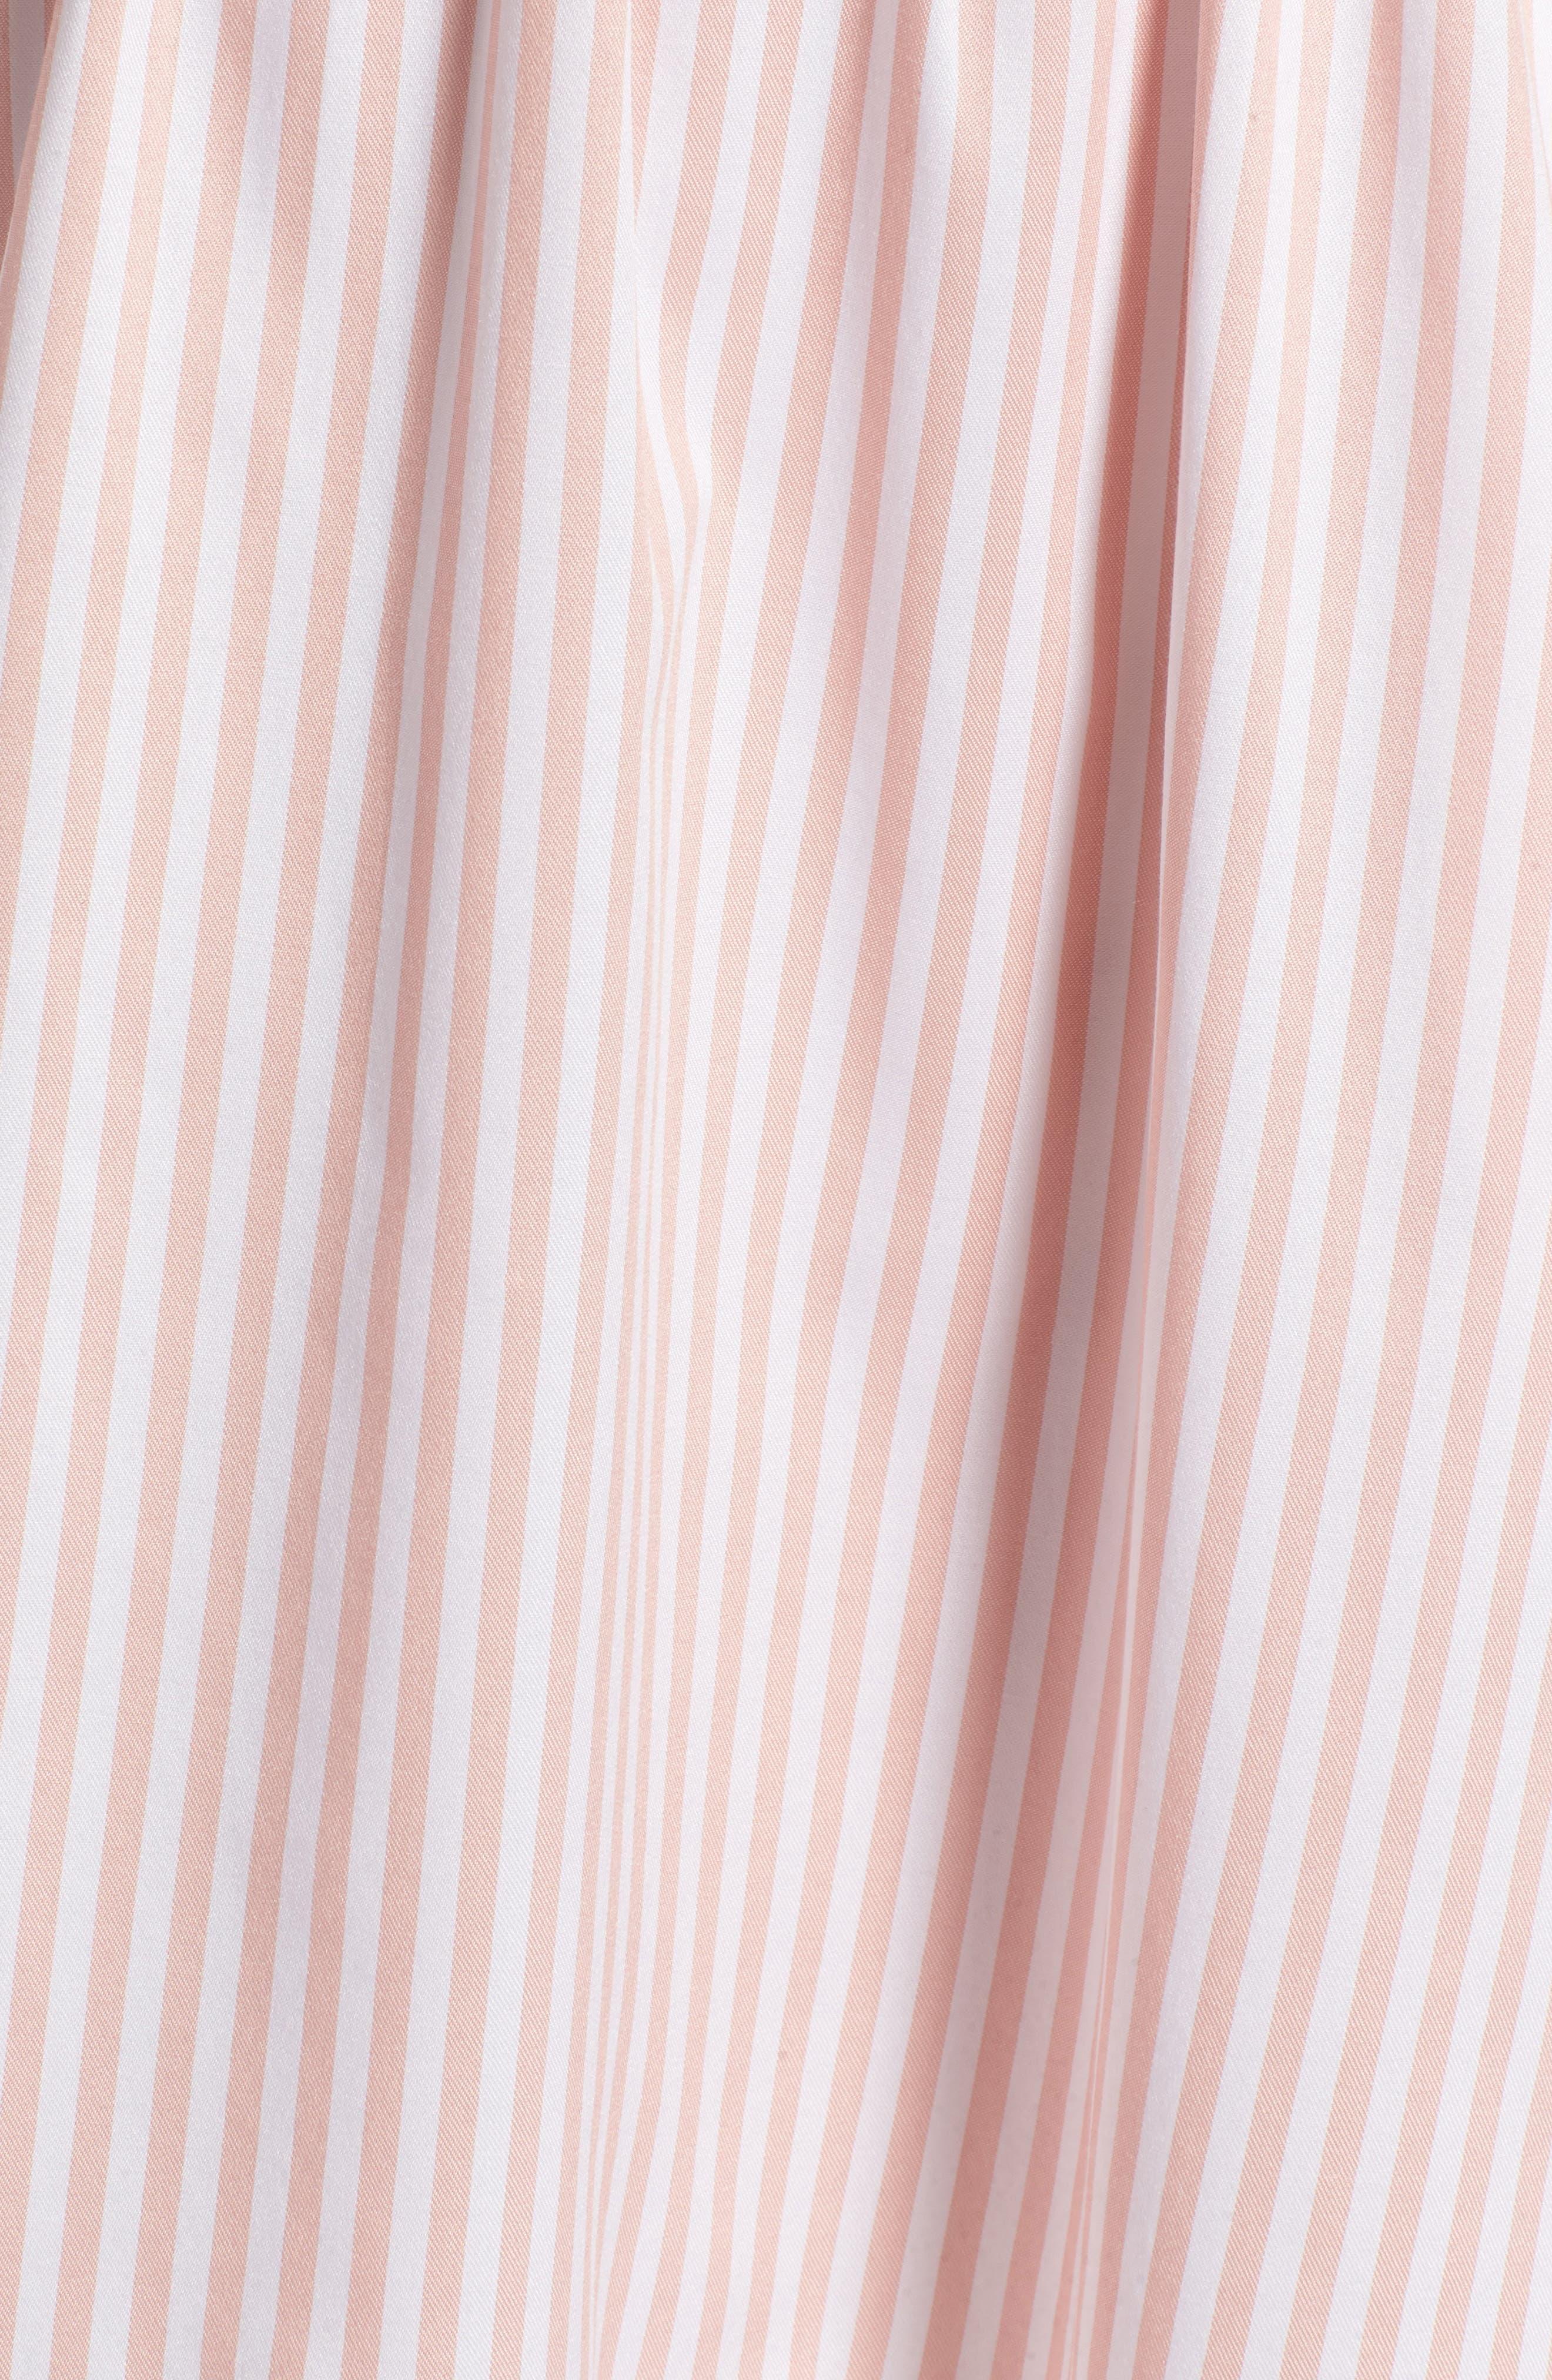 Ruffle Dress,                             Alternate thumbnail 6, color,                             660